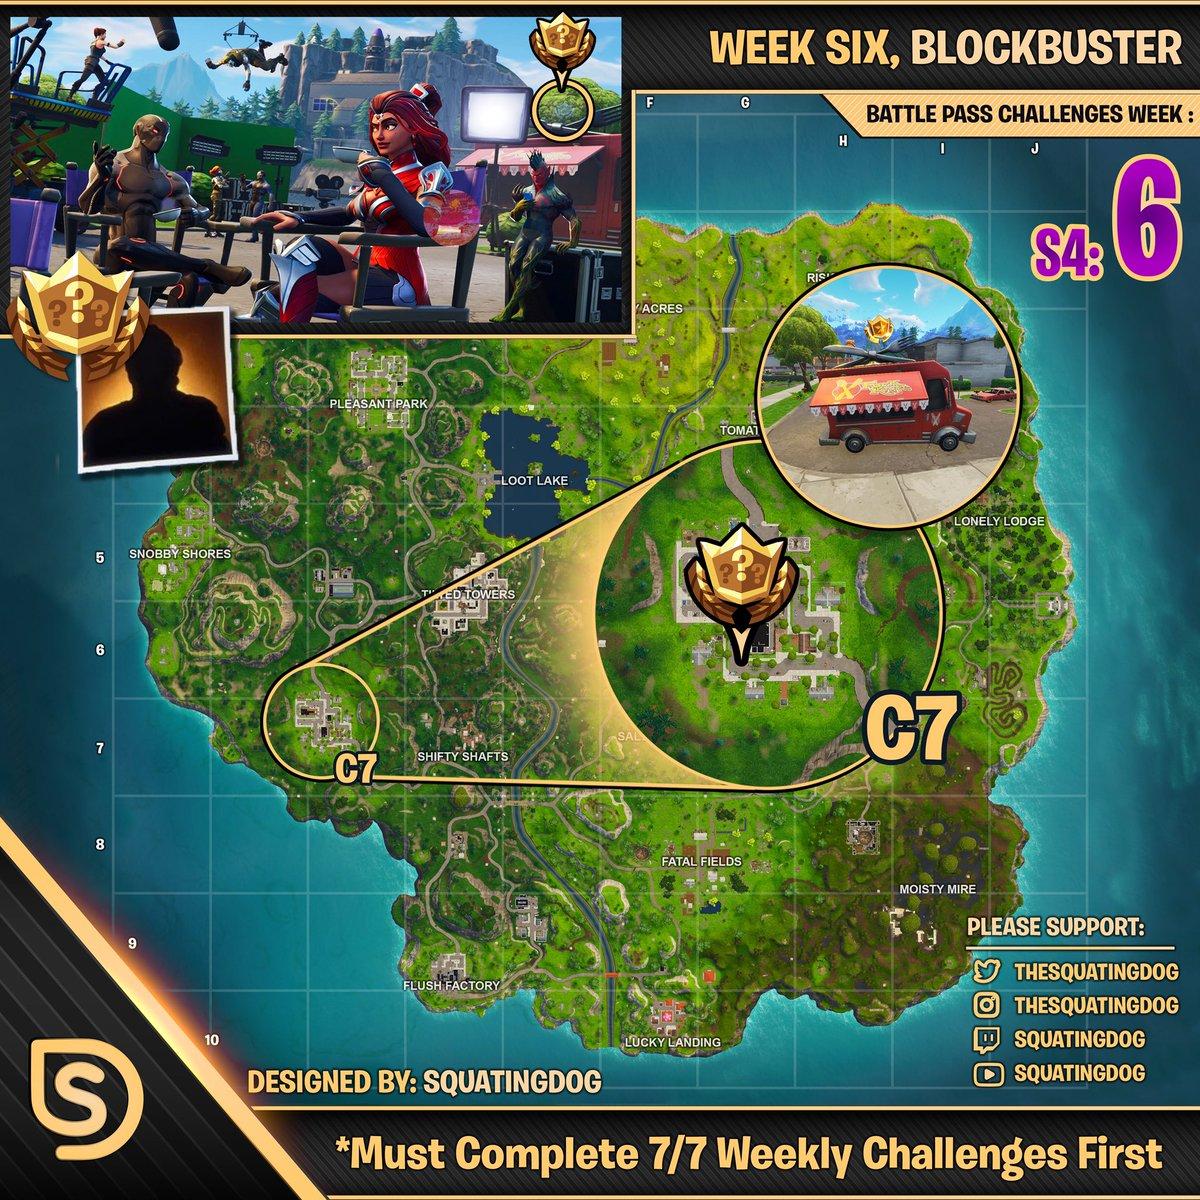 Season 4 Week 6 Blockbuster Challenge Map Wheel Of Fortnite